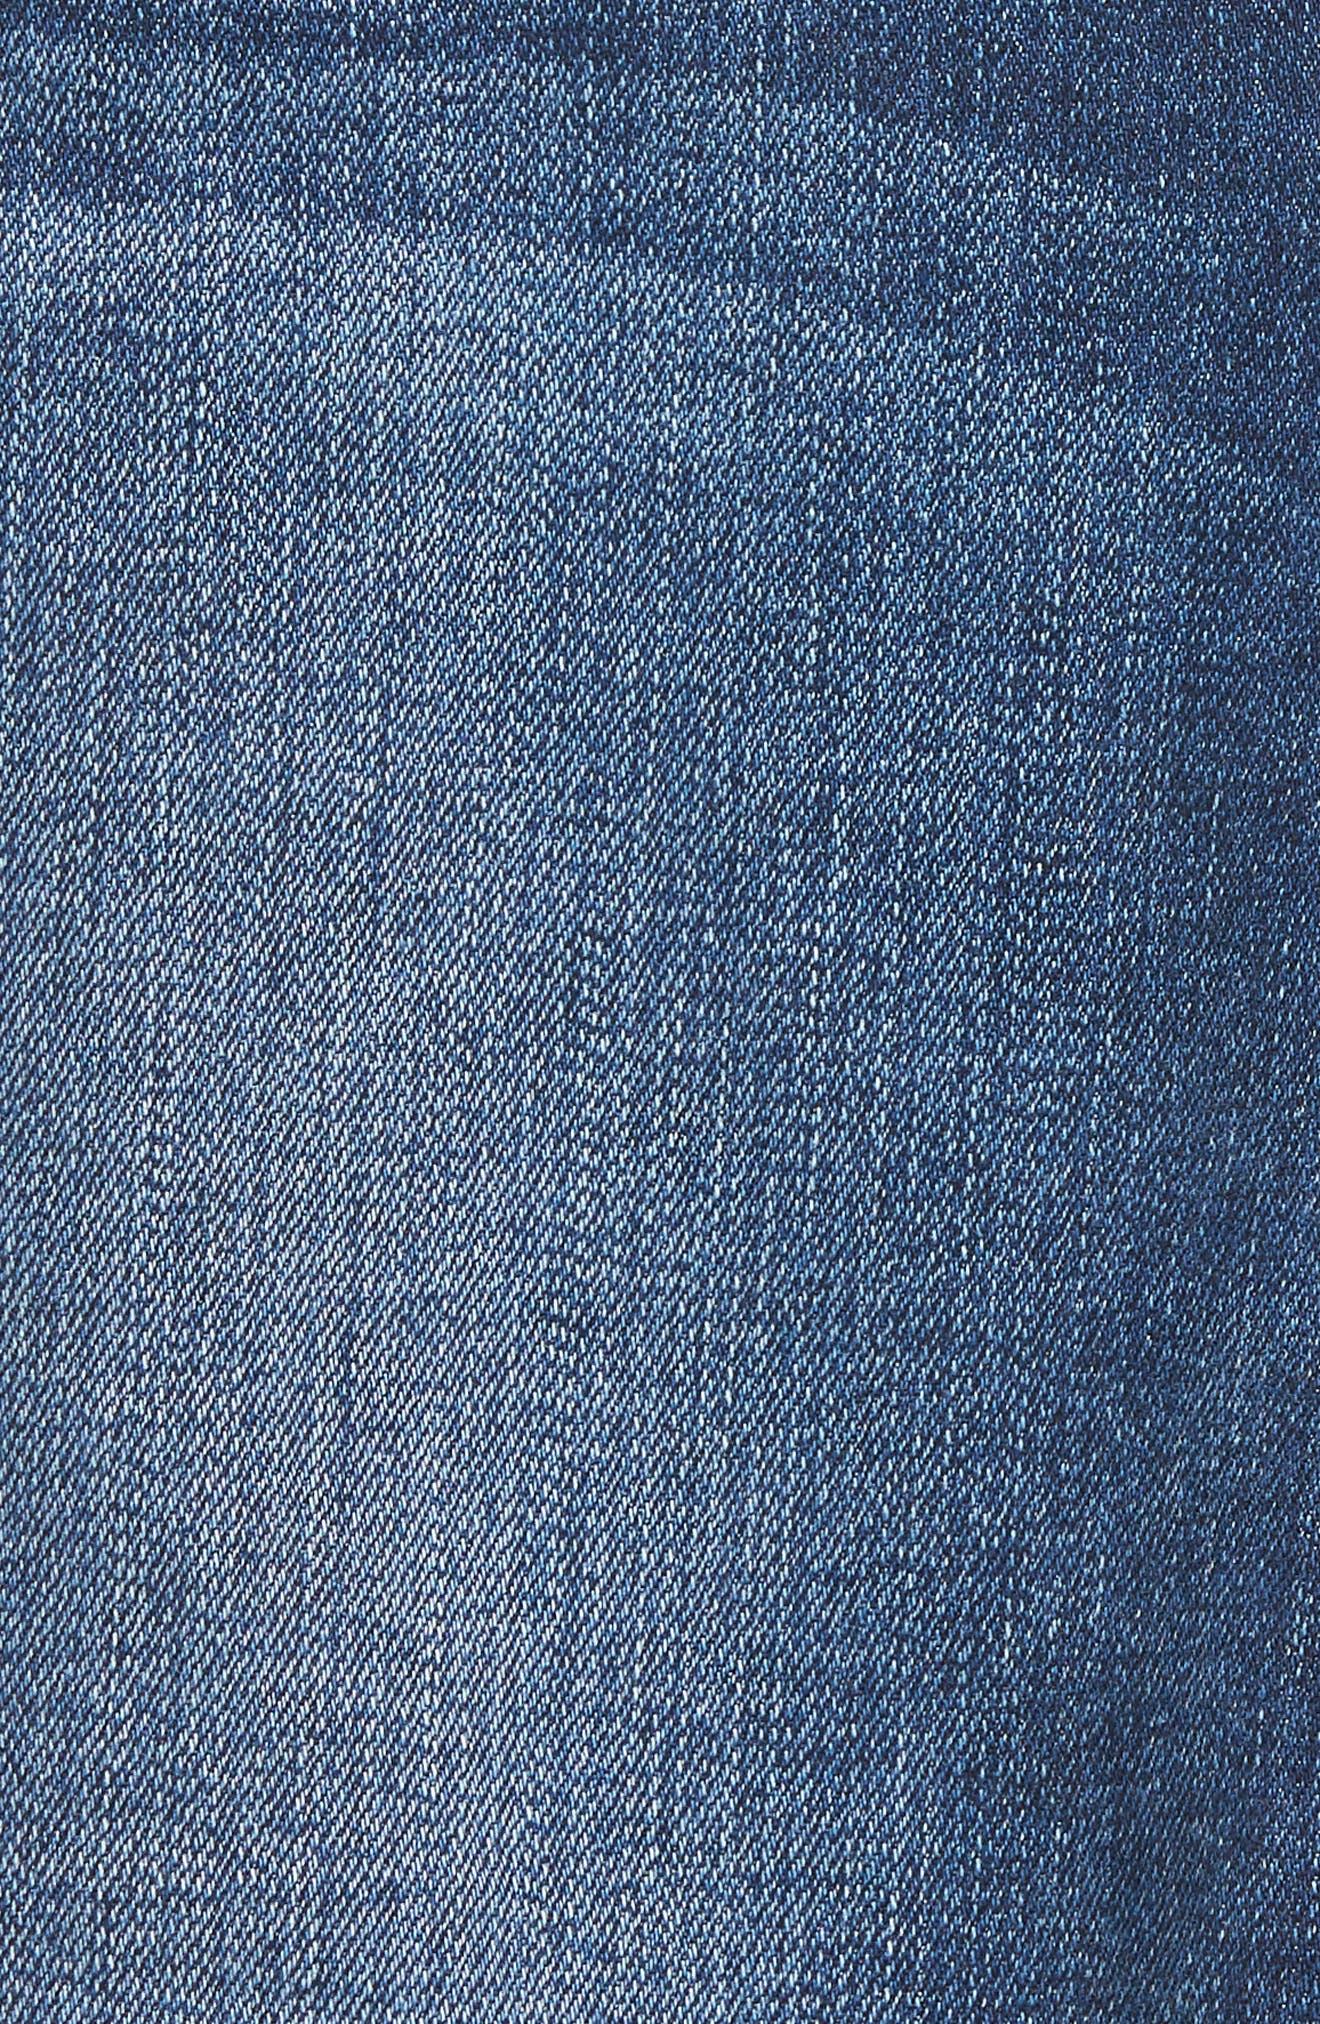 Nico Ankle Super Skinny Jeans,                             Alternate thumbnail 6, color,                             420